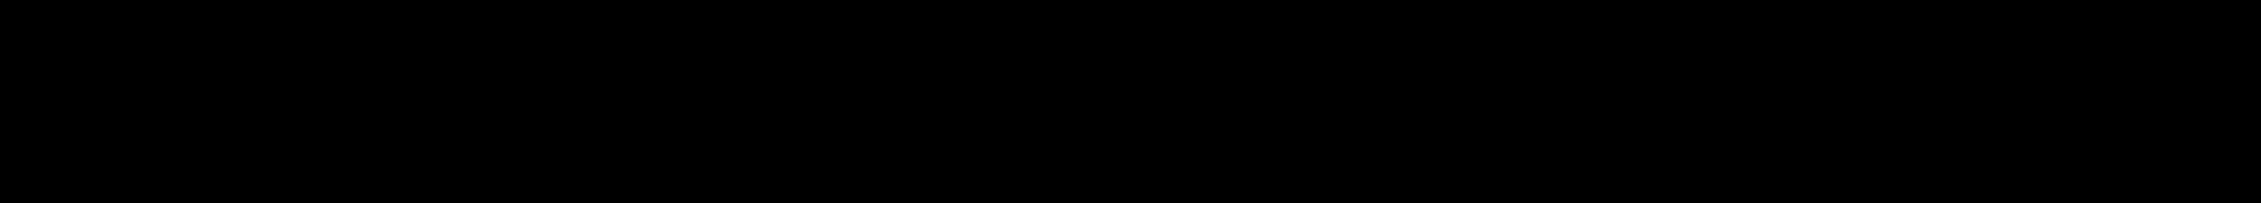 Copperplate Modern Light